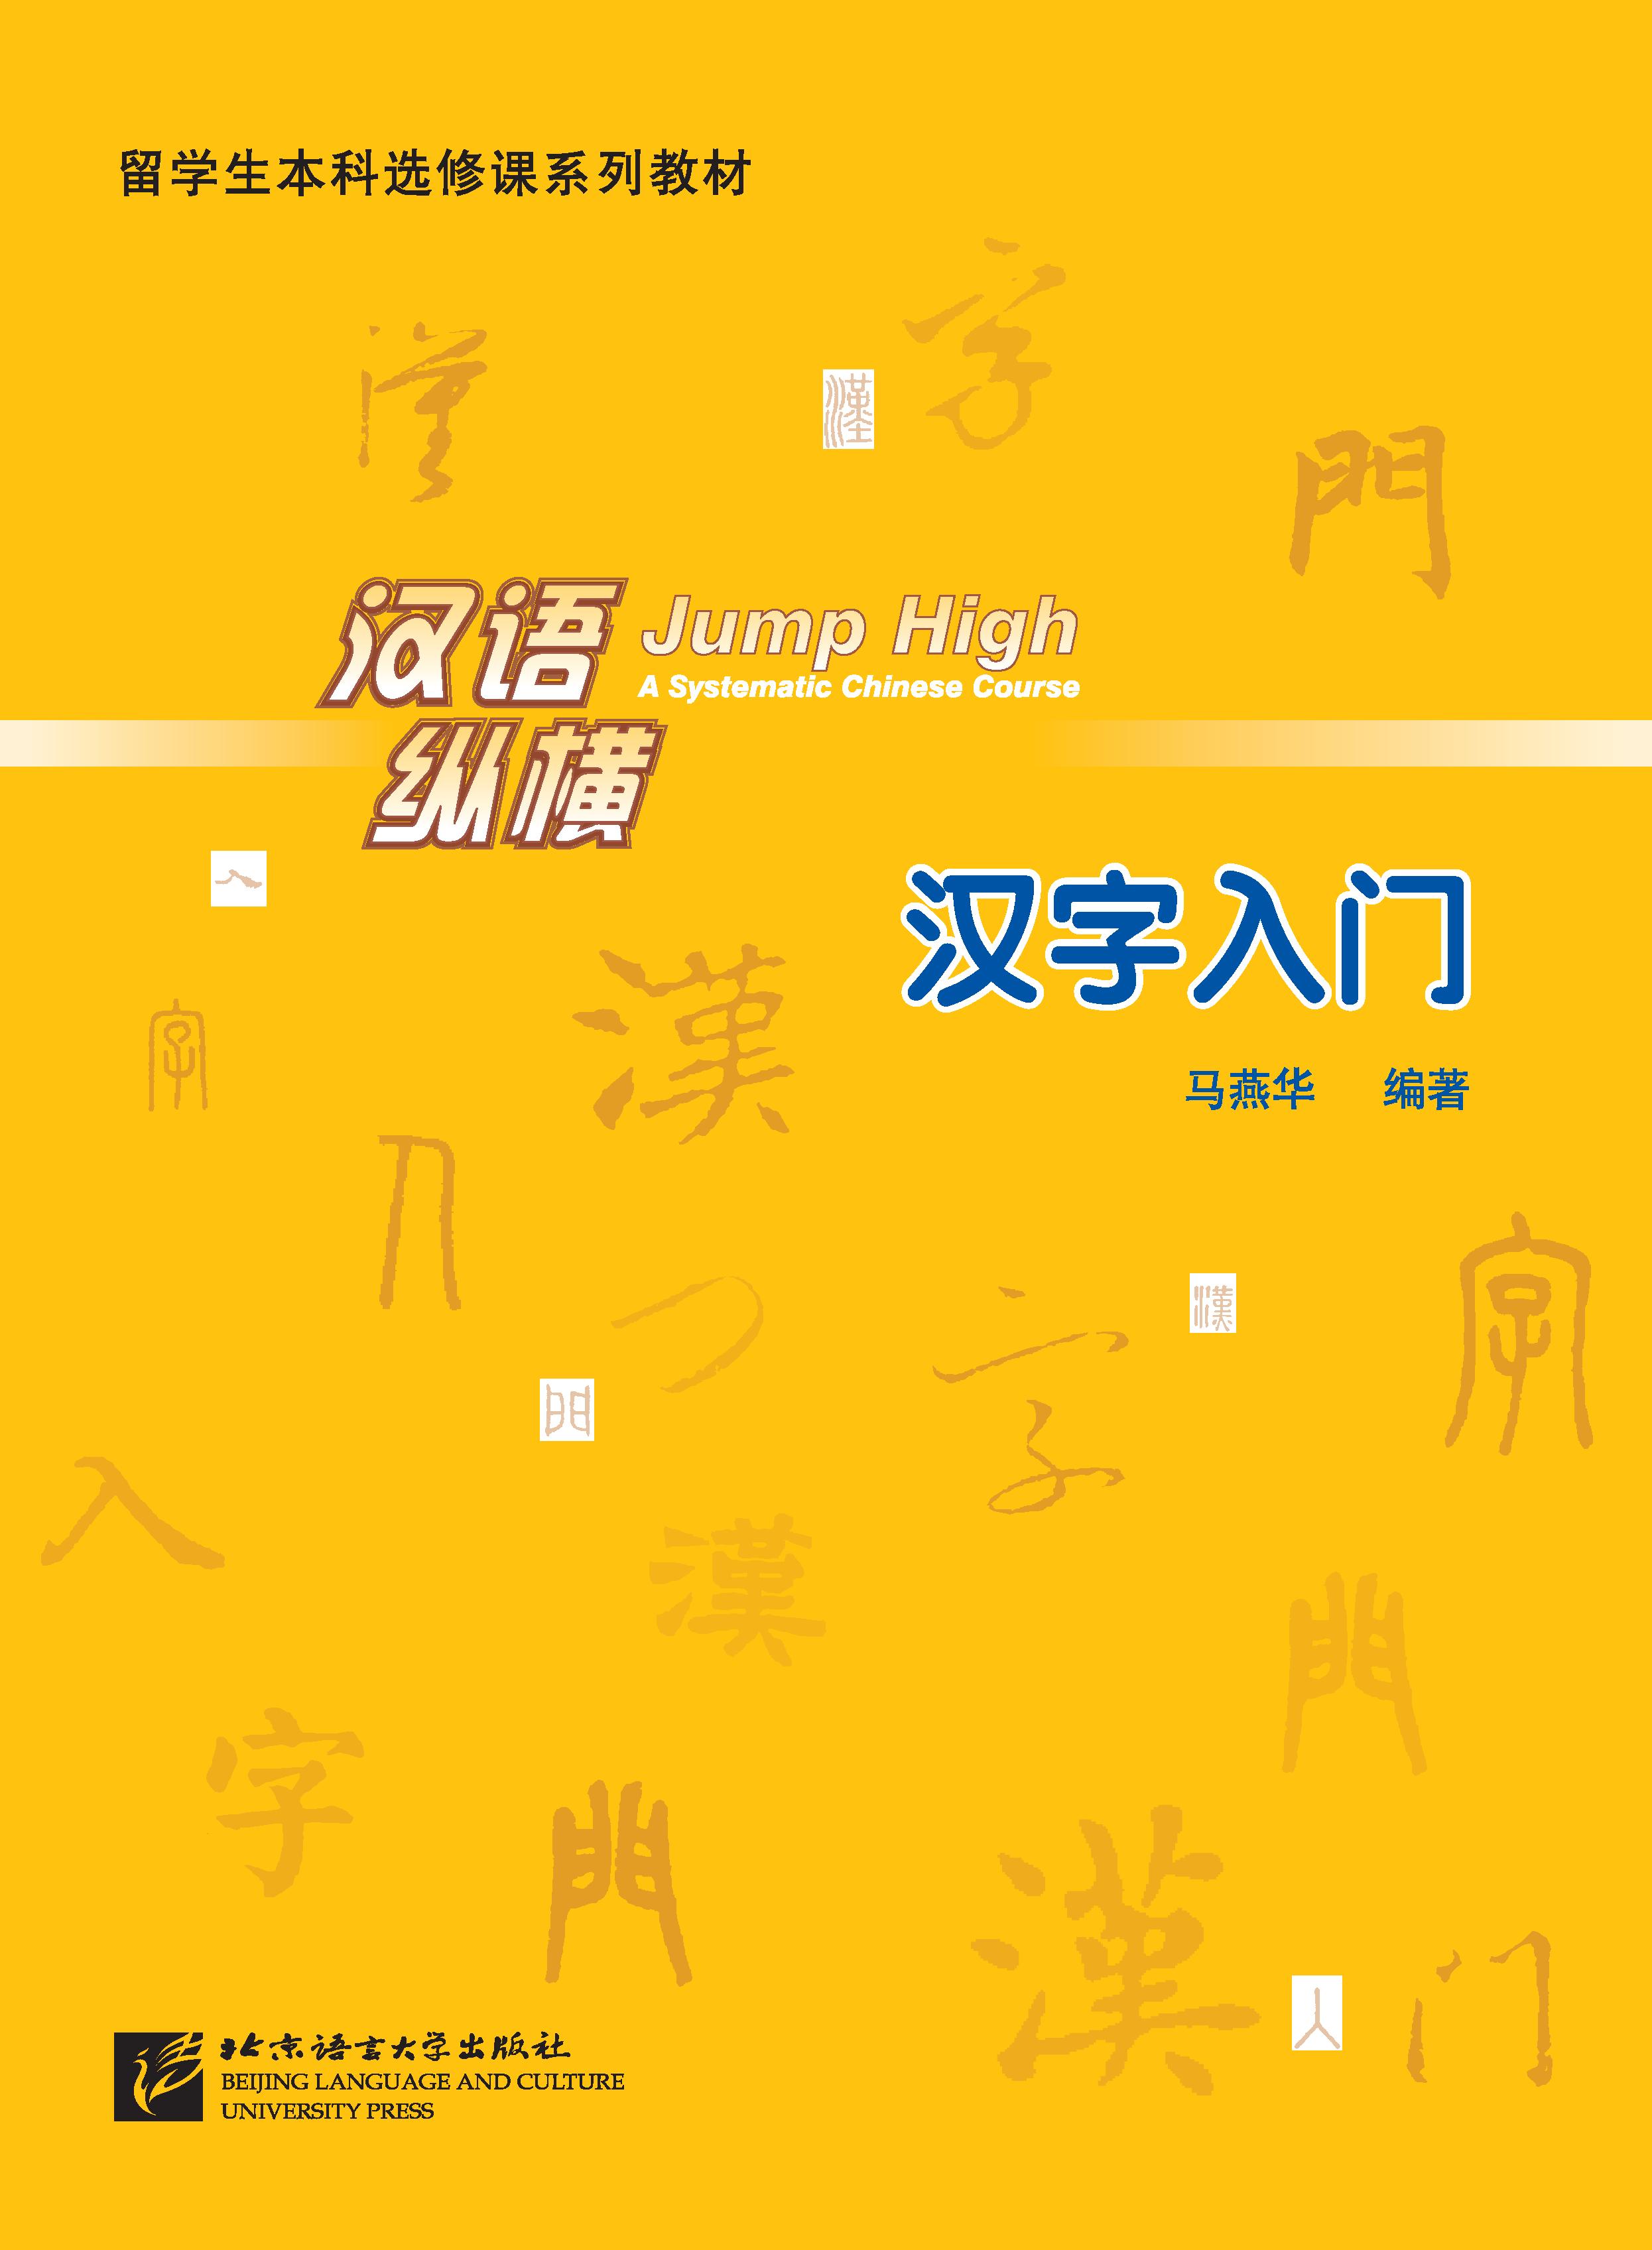 汉语·纵横:汉字入门 Jump High a Systematic Chinese Course